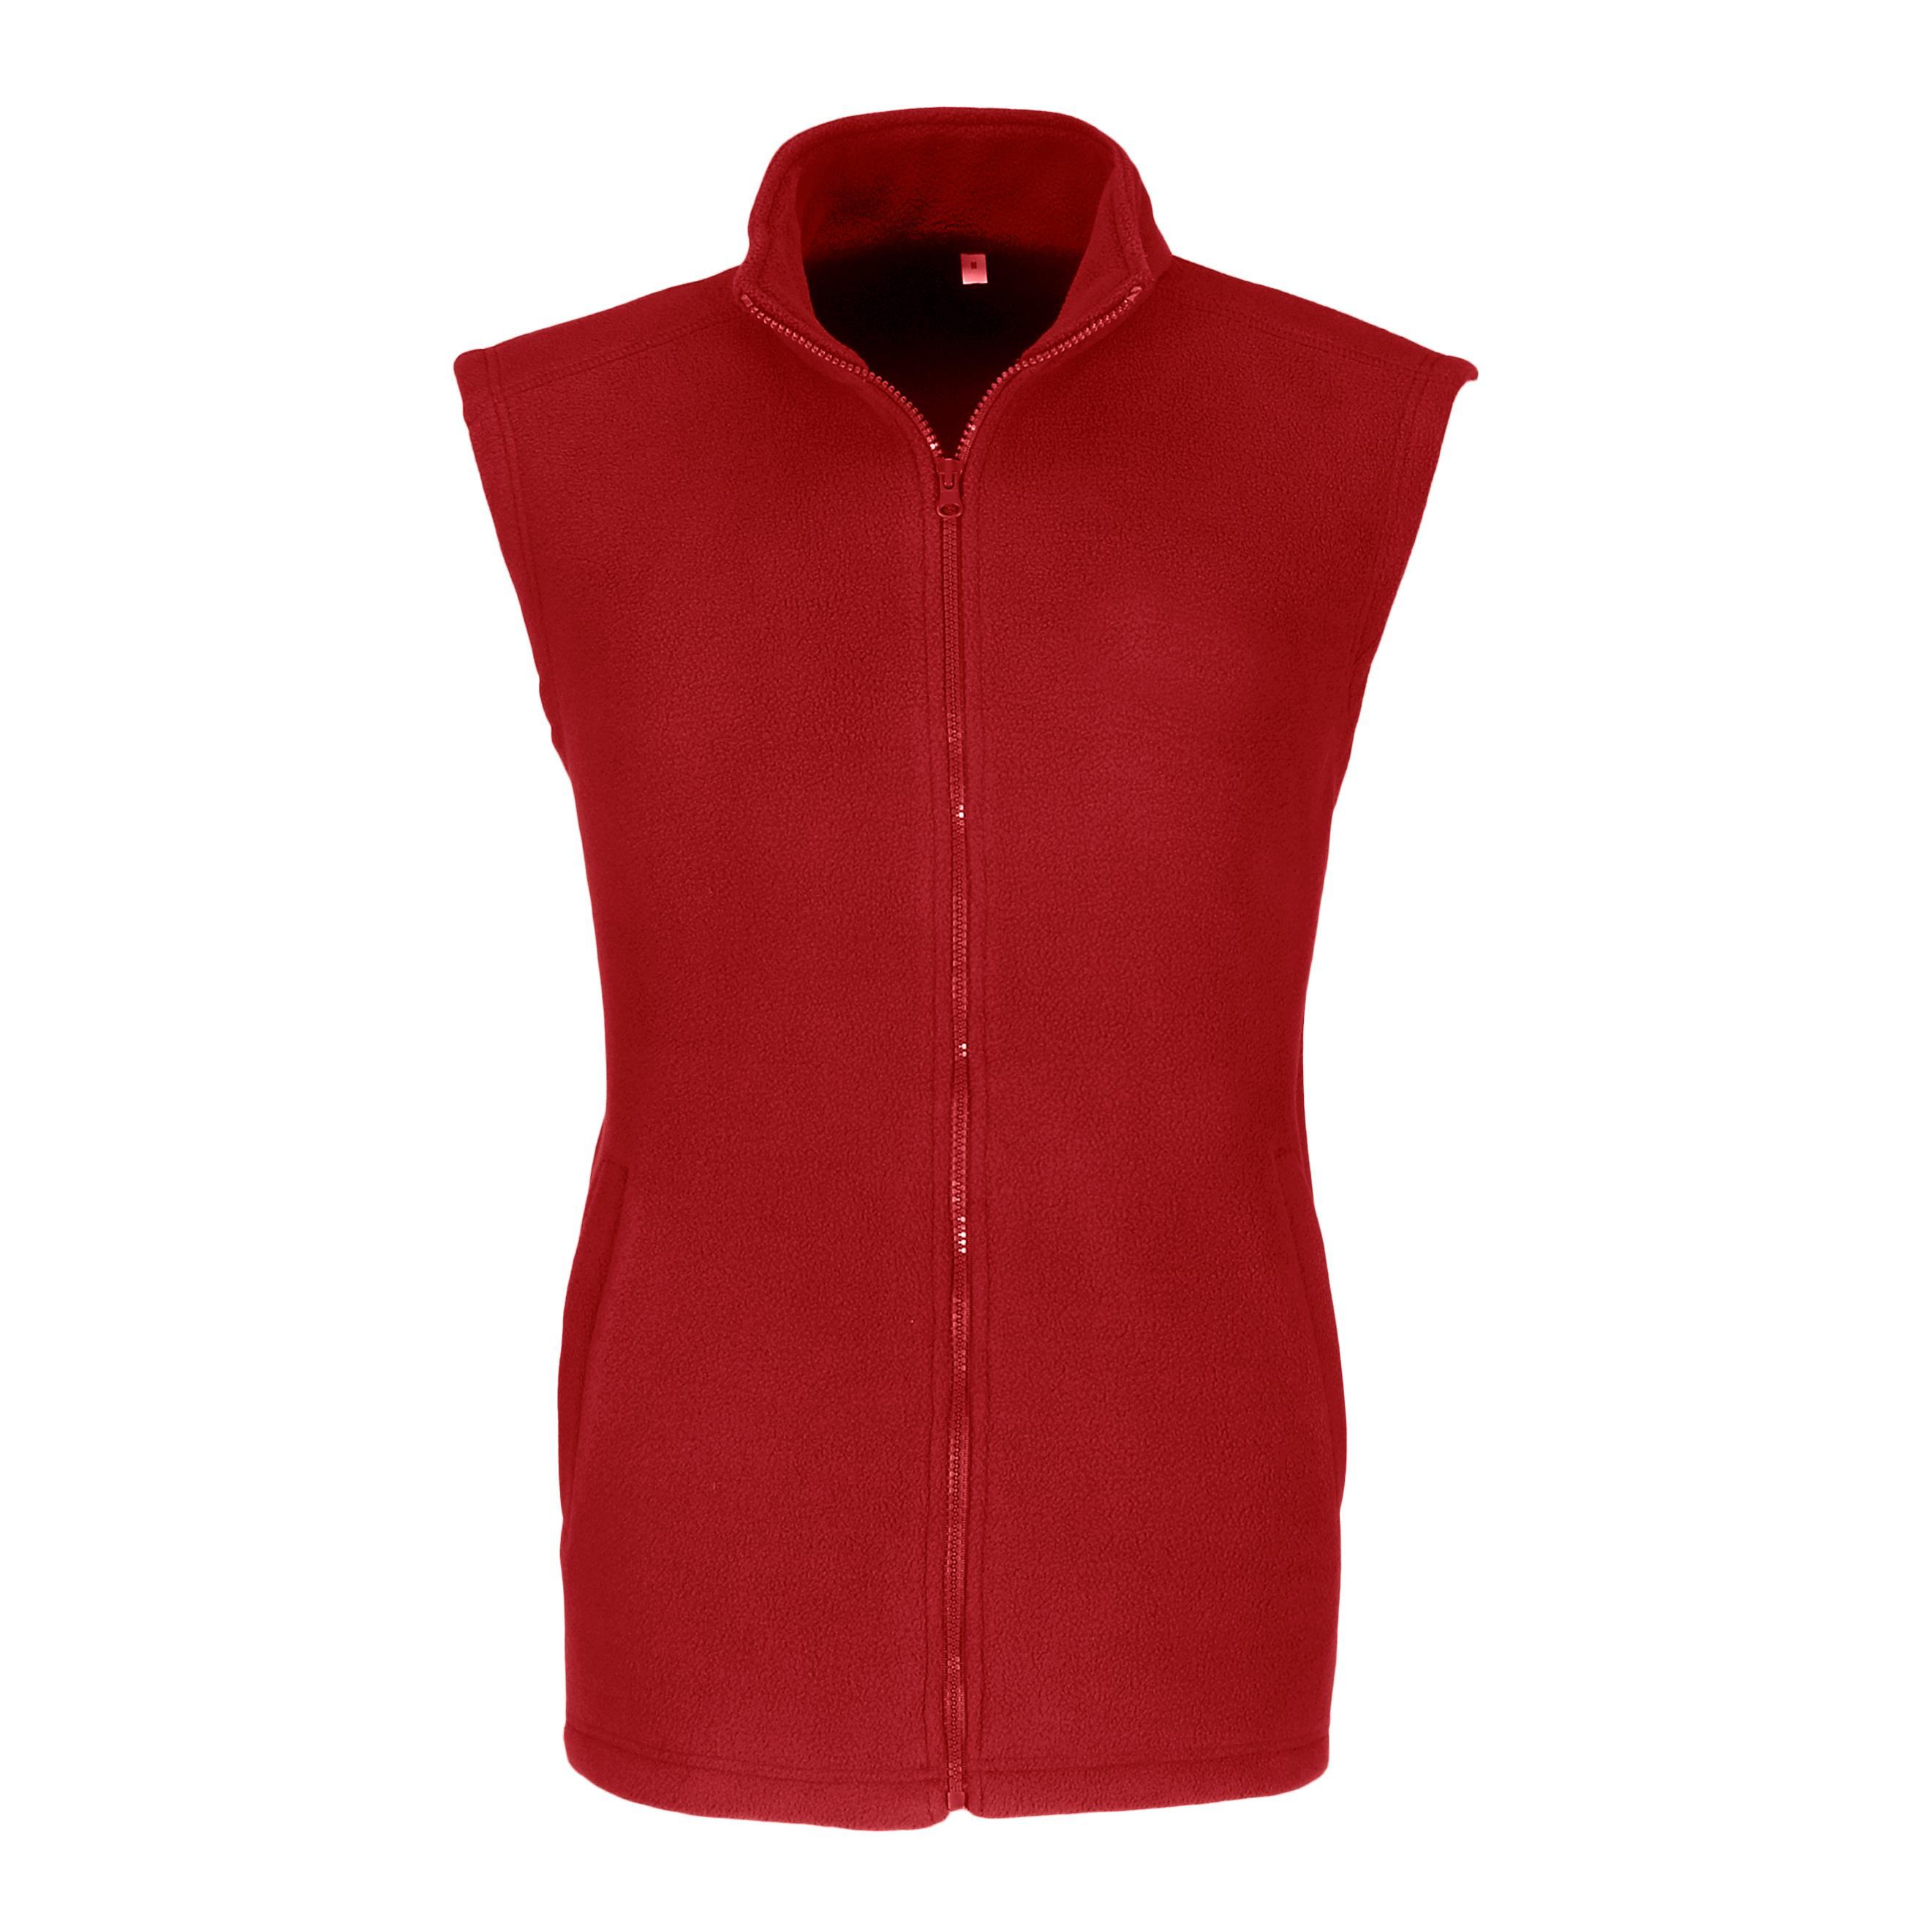 Mens Yukon Micro Fleece Bodywarmer - Red Only